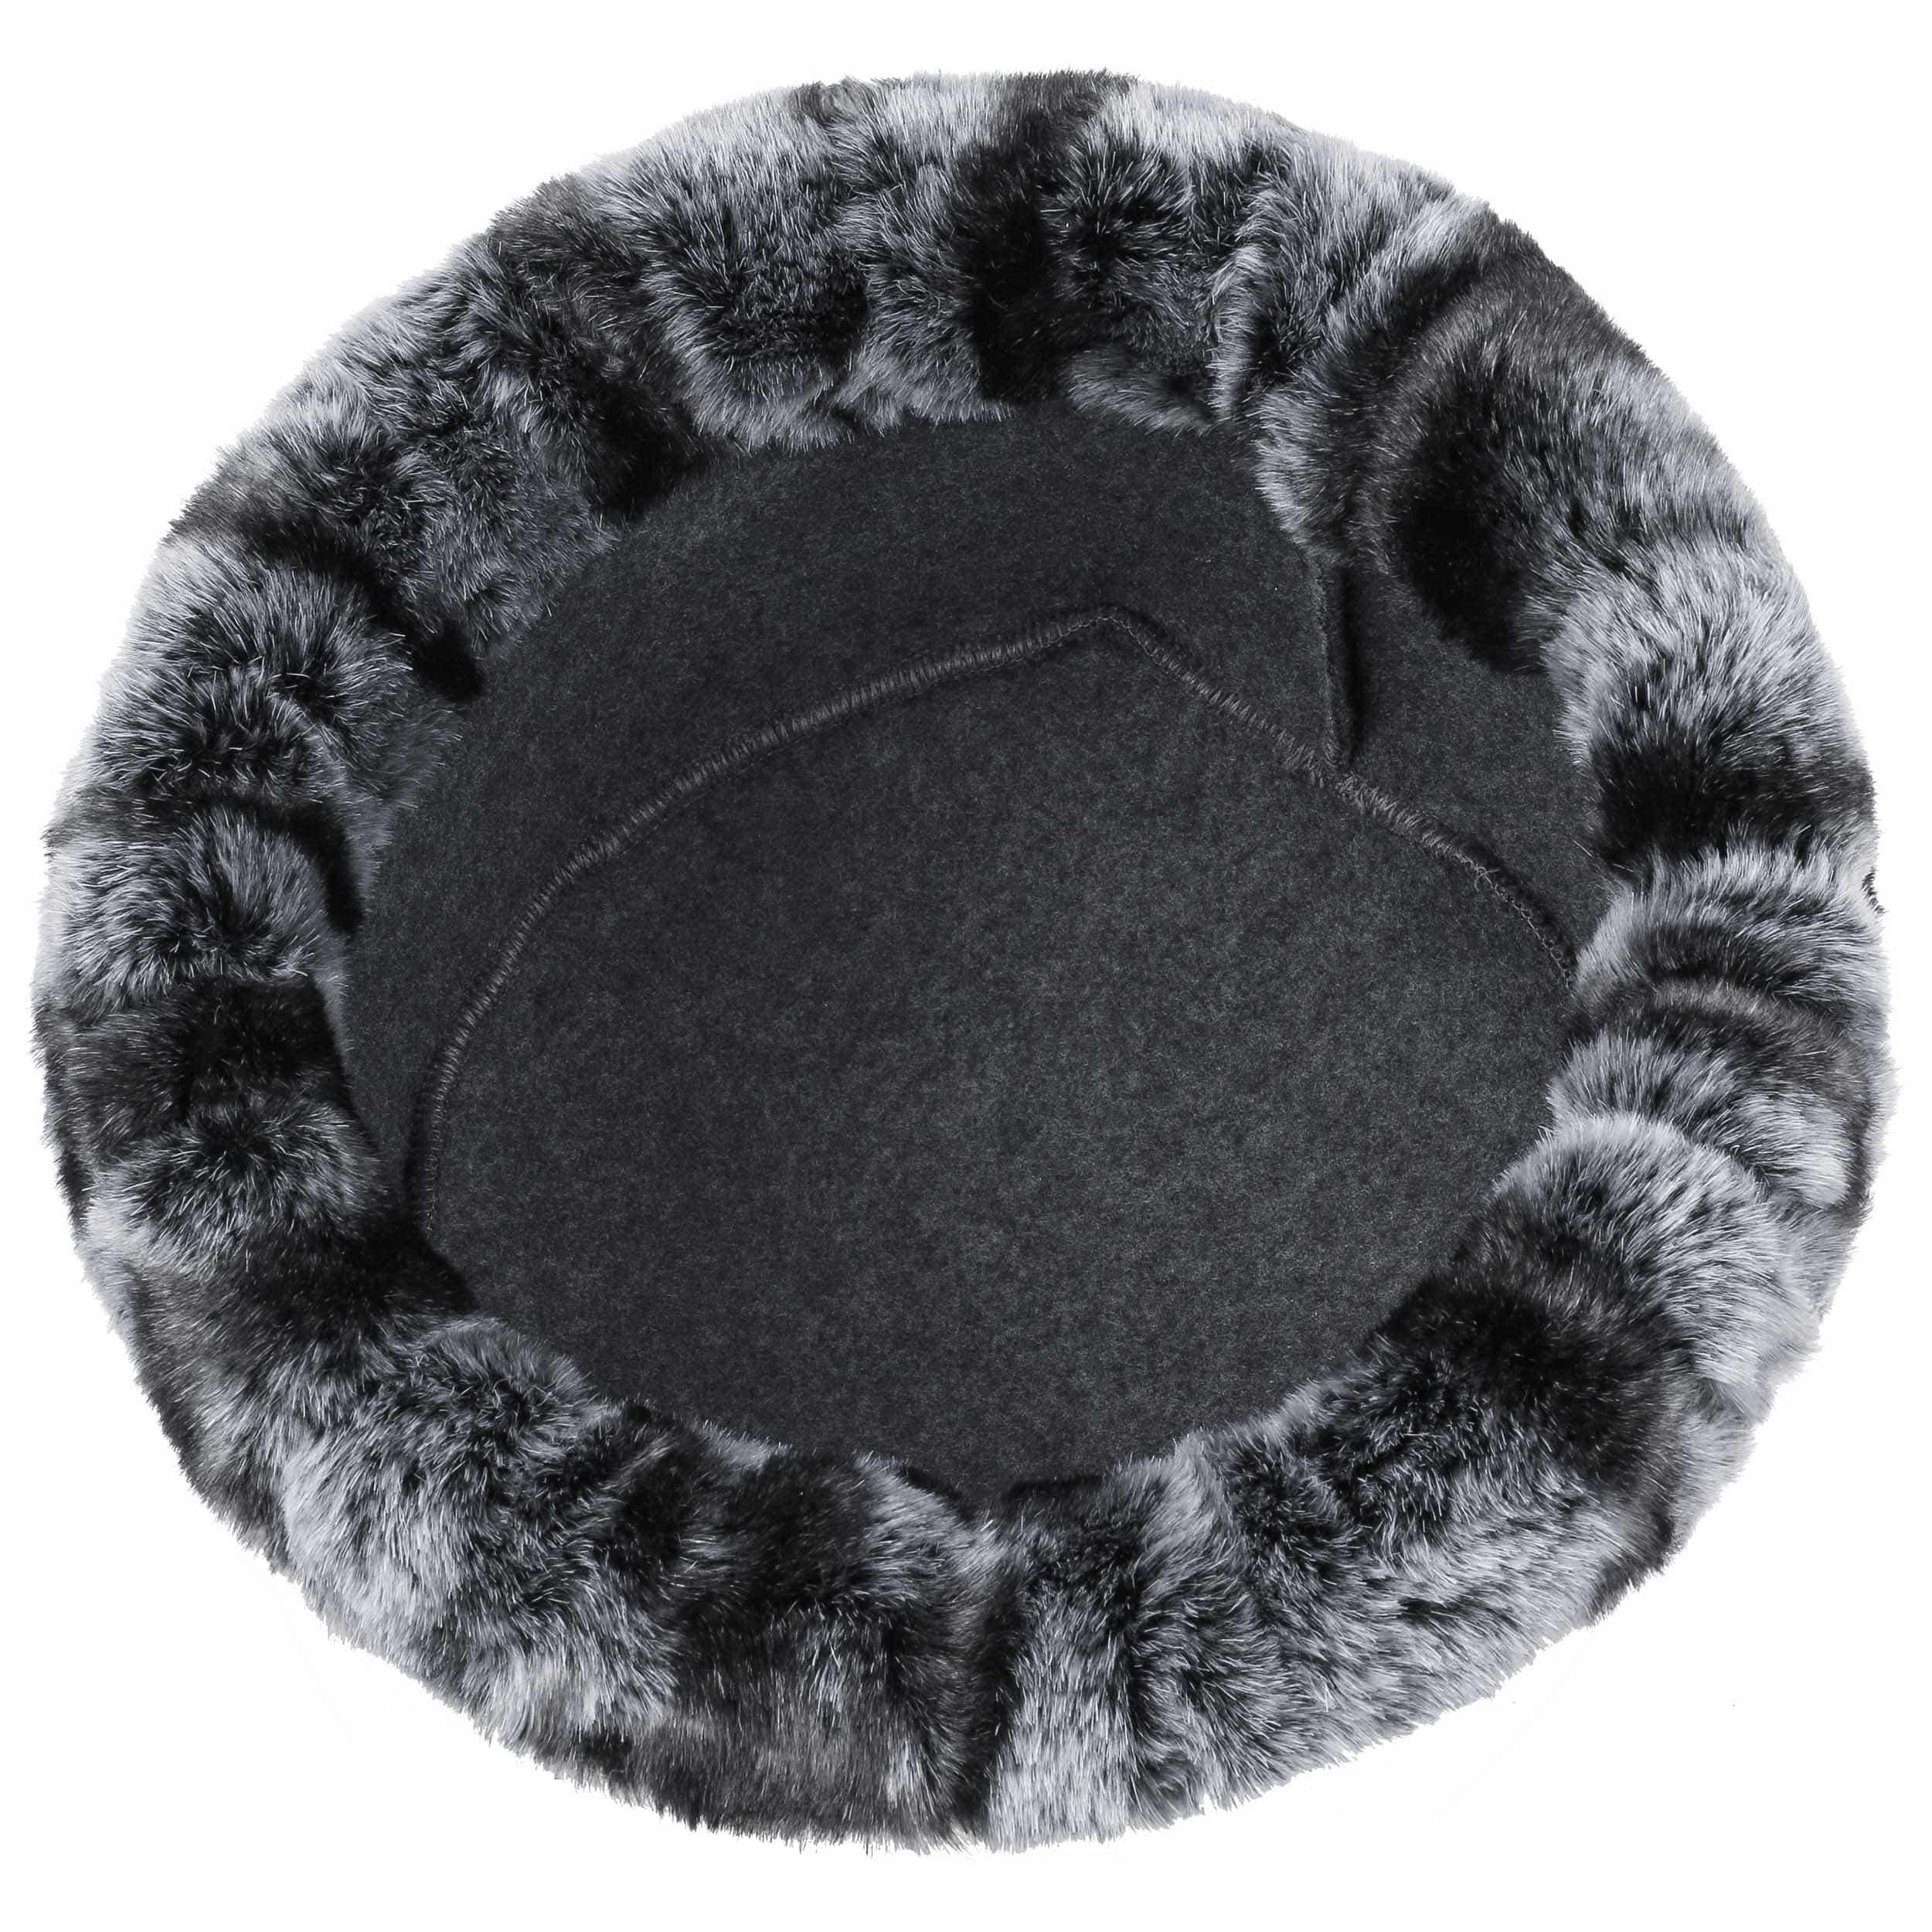 3a501db9a5de0 Sombrero Pelo Sintético Alexa by Gebeana - Gorros - sombreroshop.es